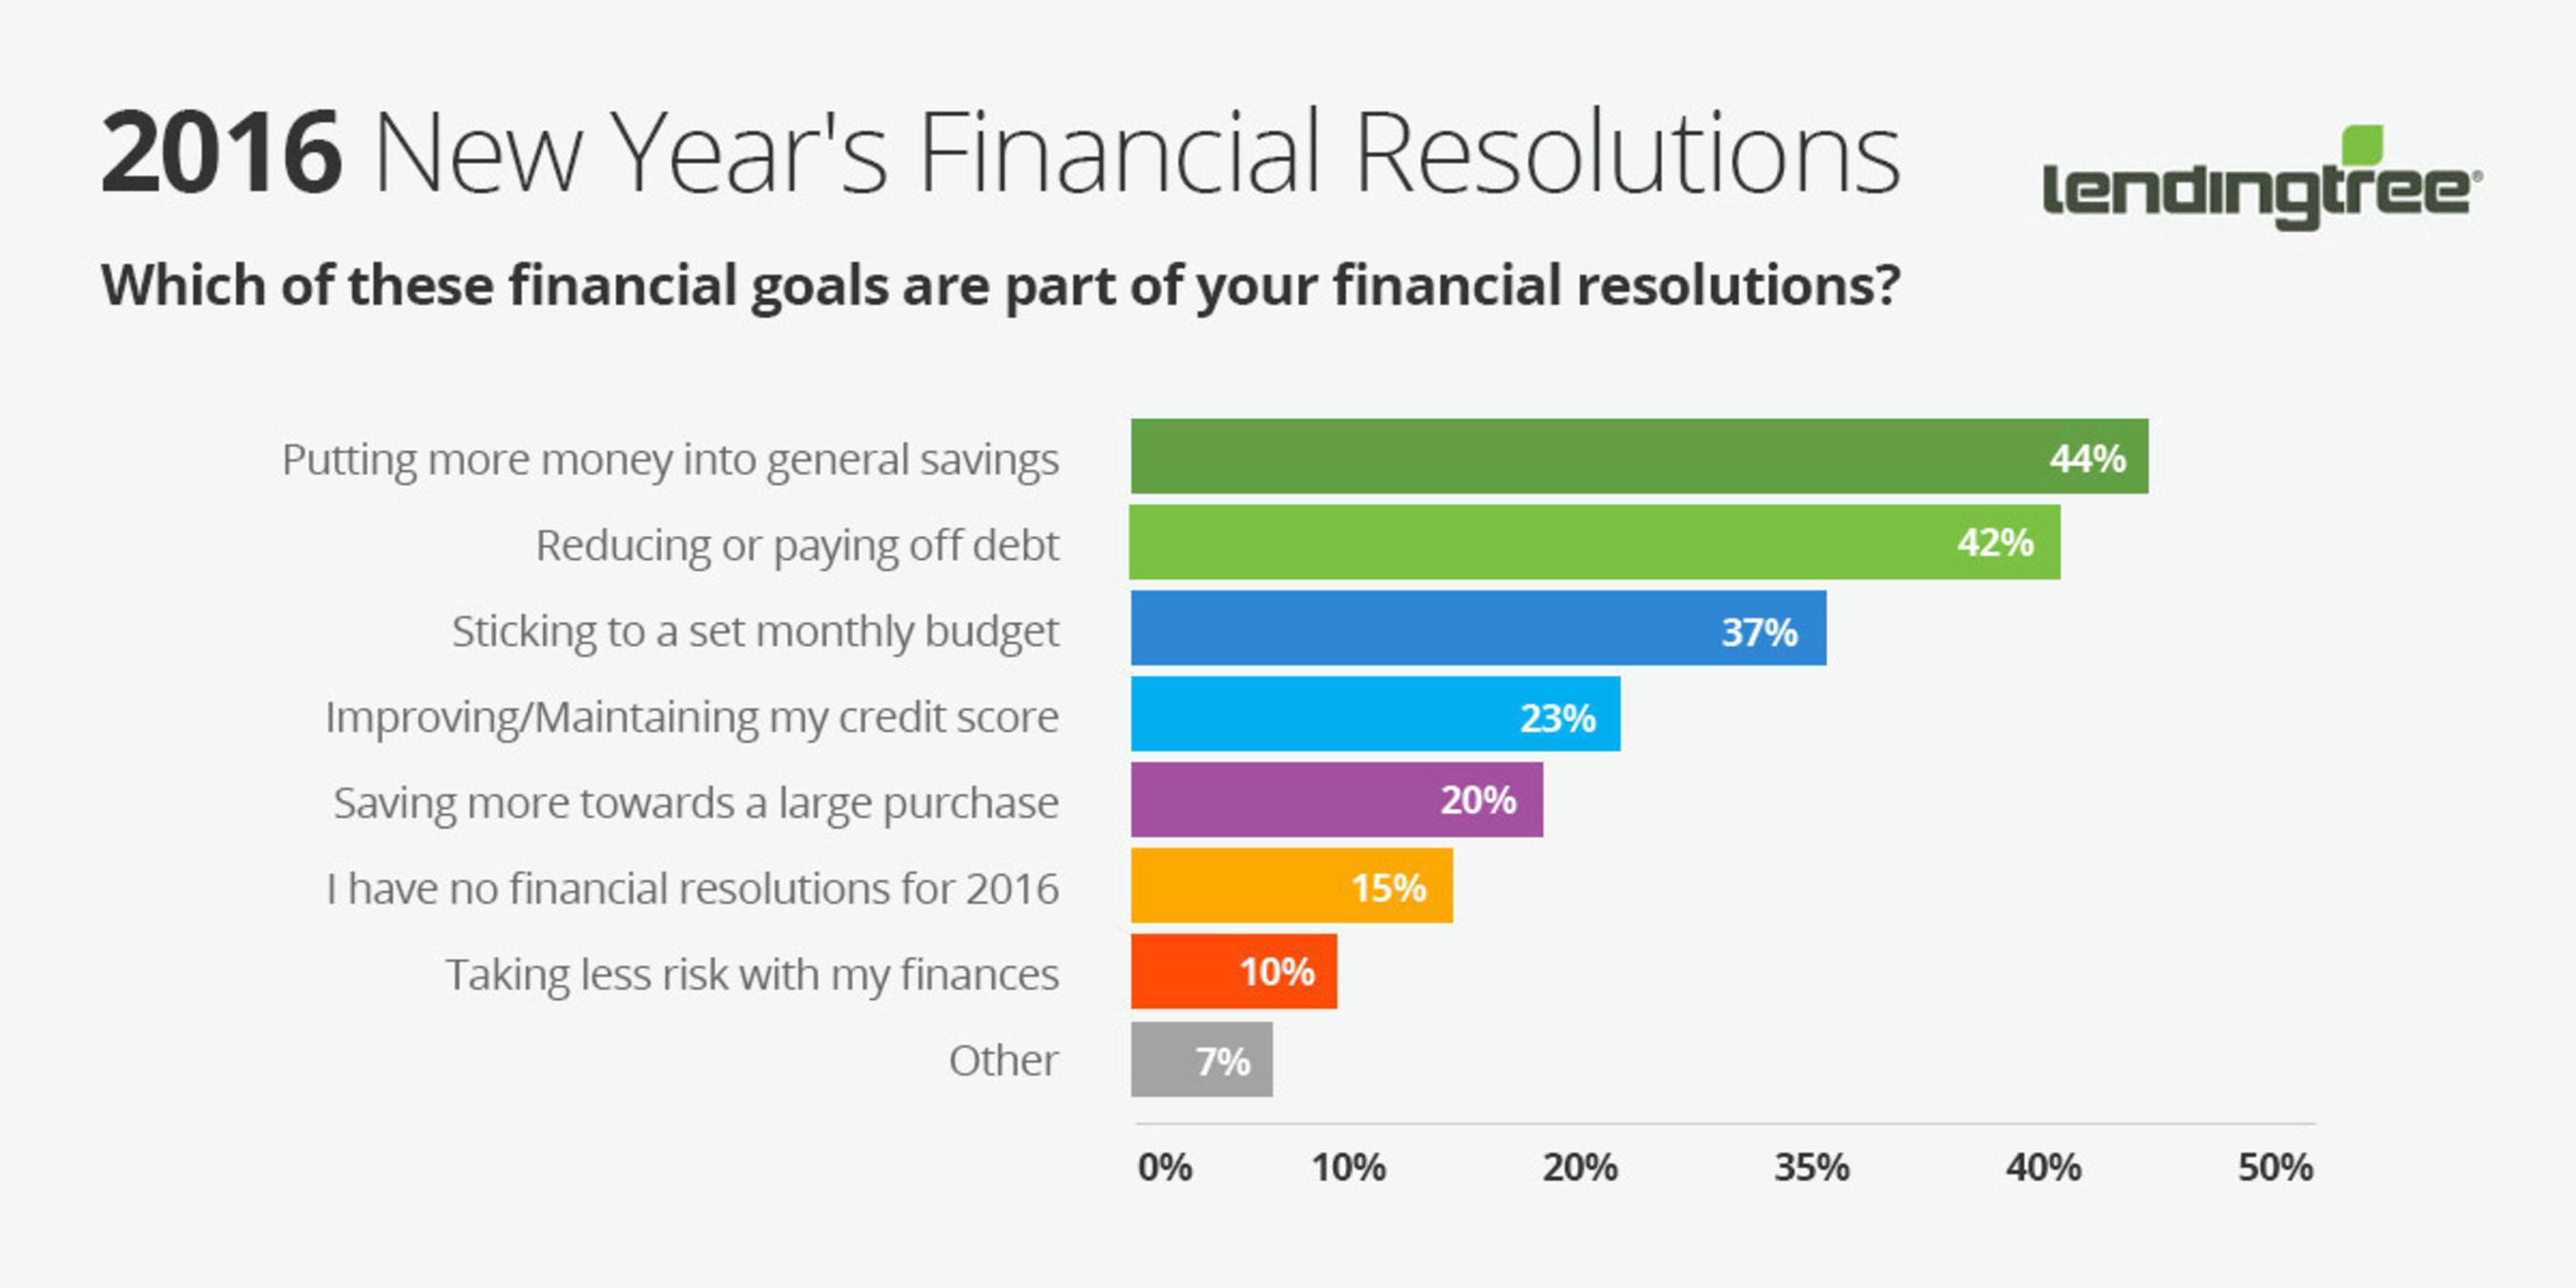 LendingTree: Financial Resolutions for 2016